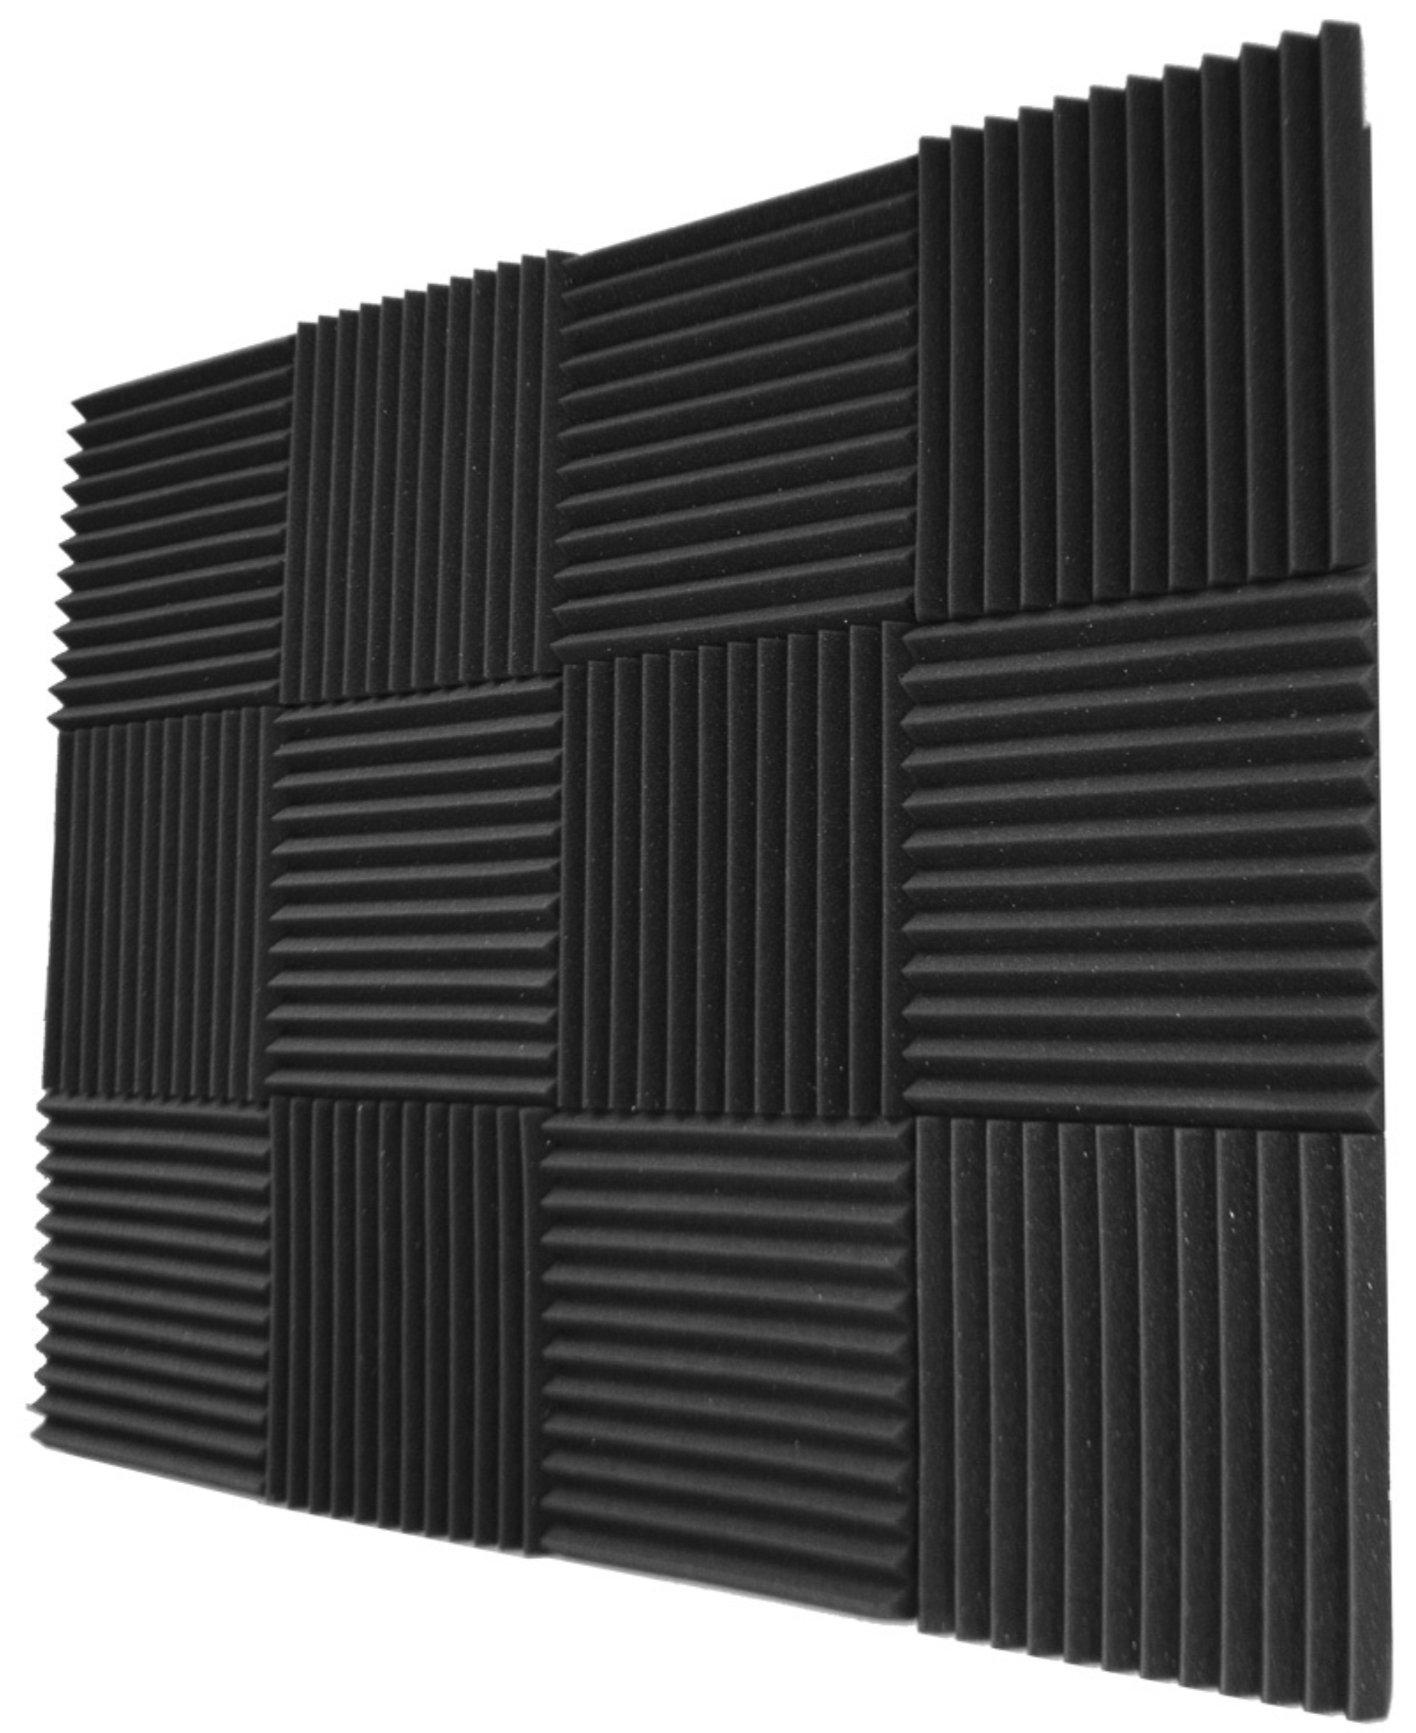 12 Pack- Acoustic Panels Studio Foam Wedges 1'' X 12'' X 12''